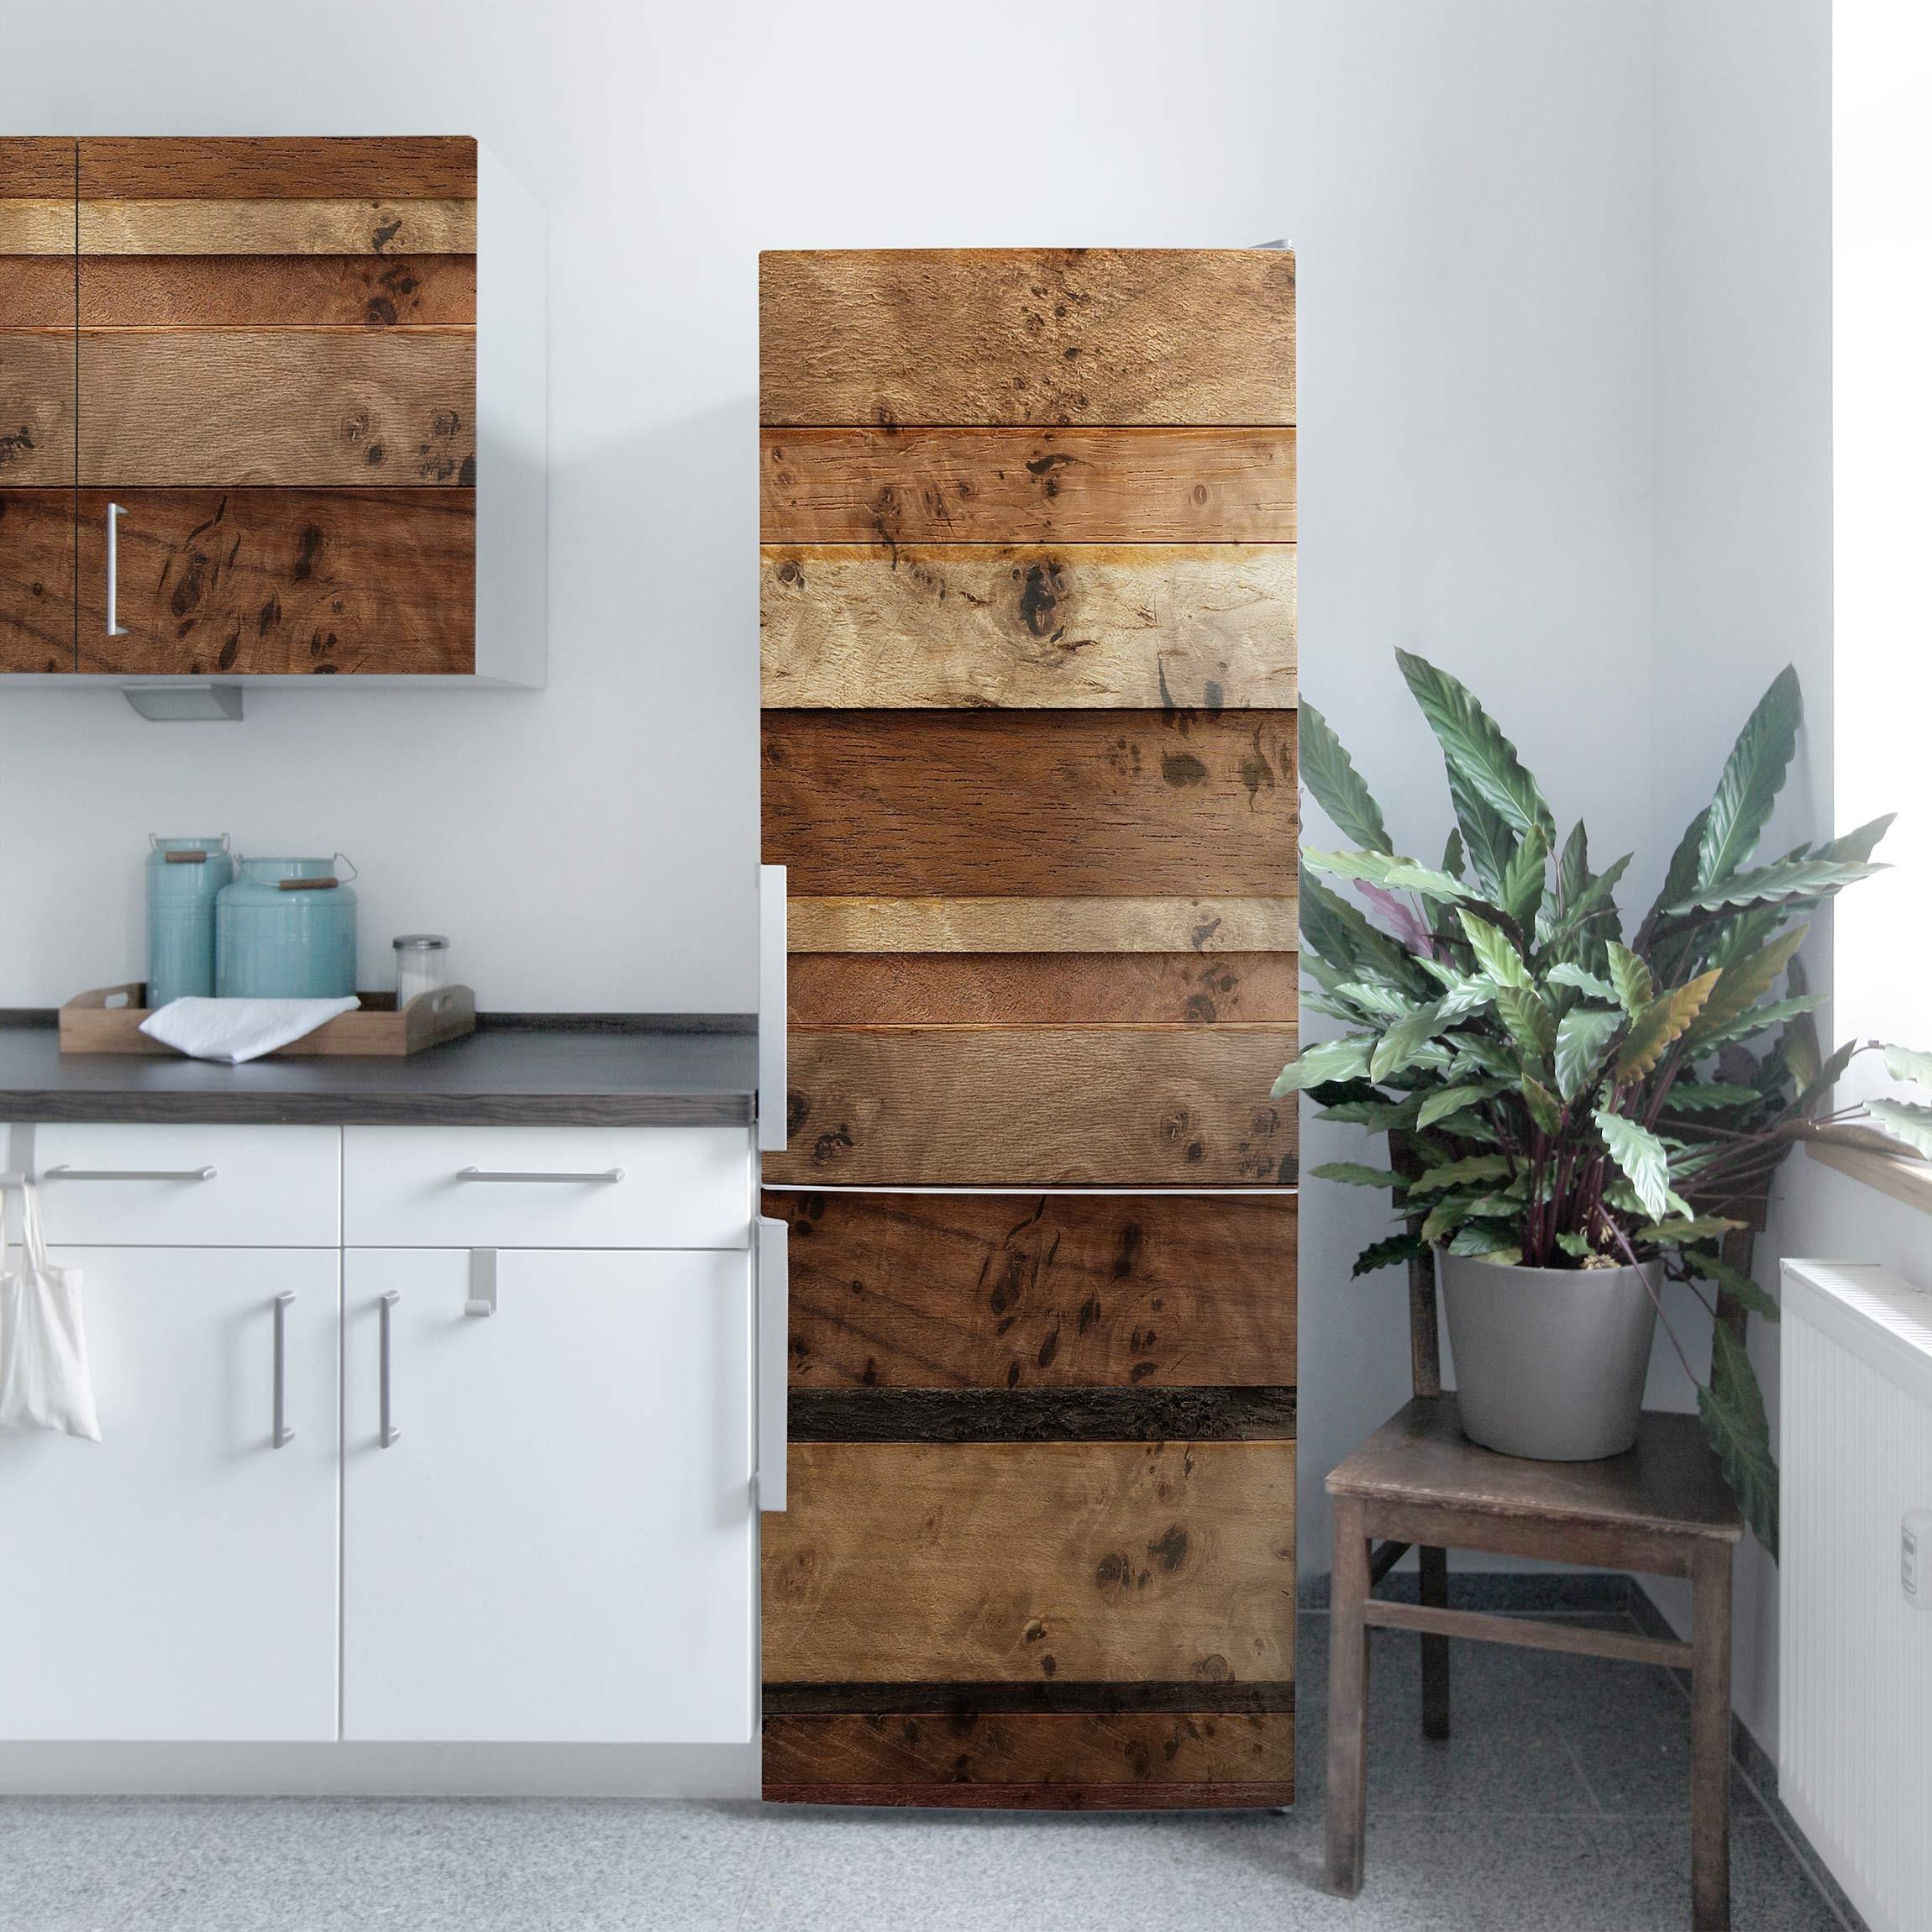 Carta adesiva per mobili woody birdseye - Carta adesiva per mobili cucina ...